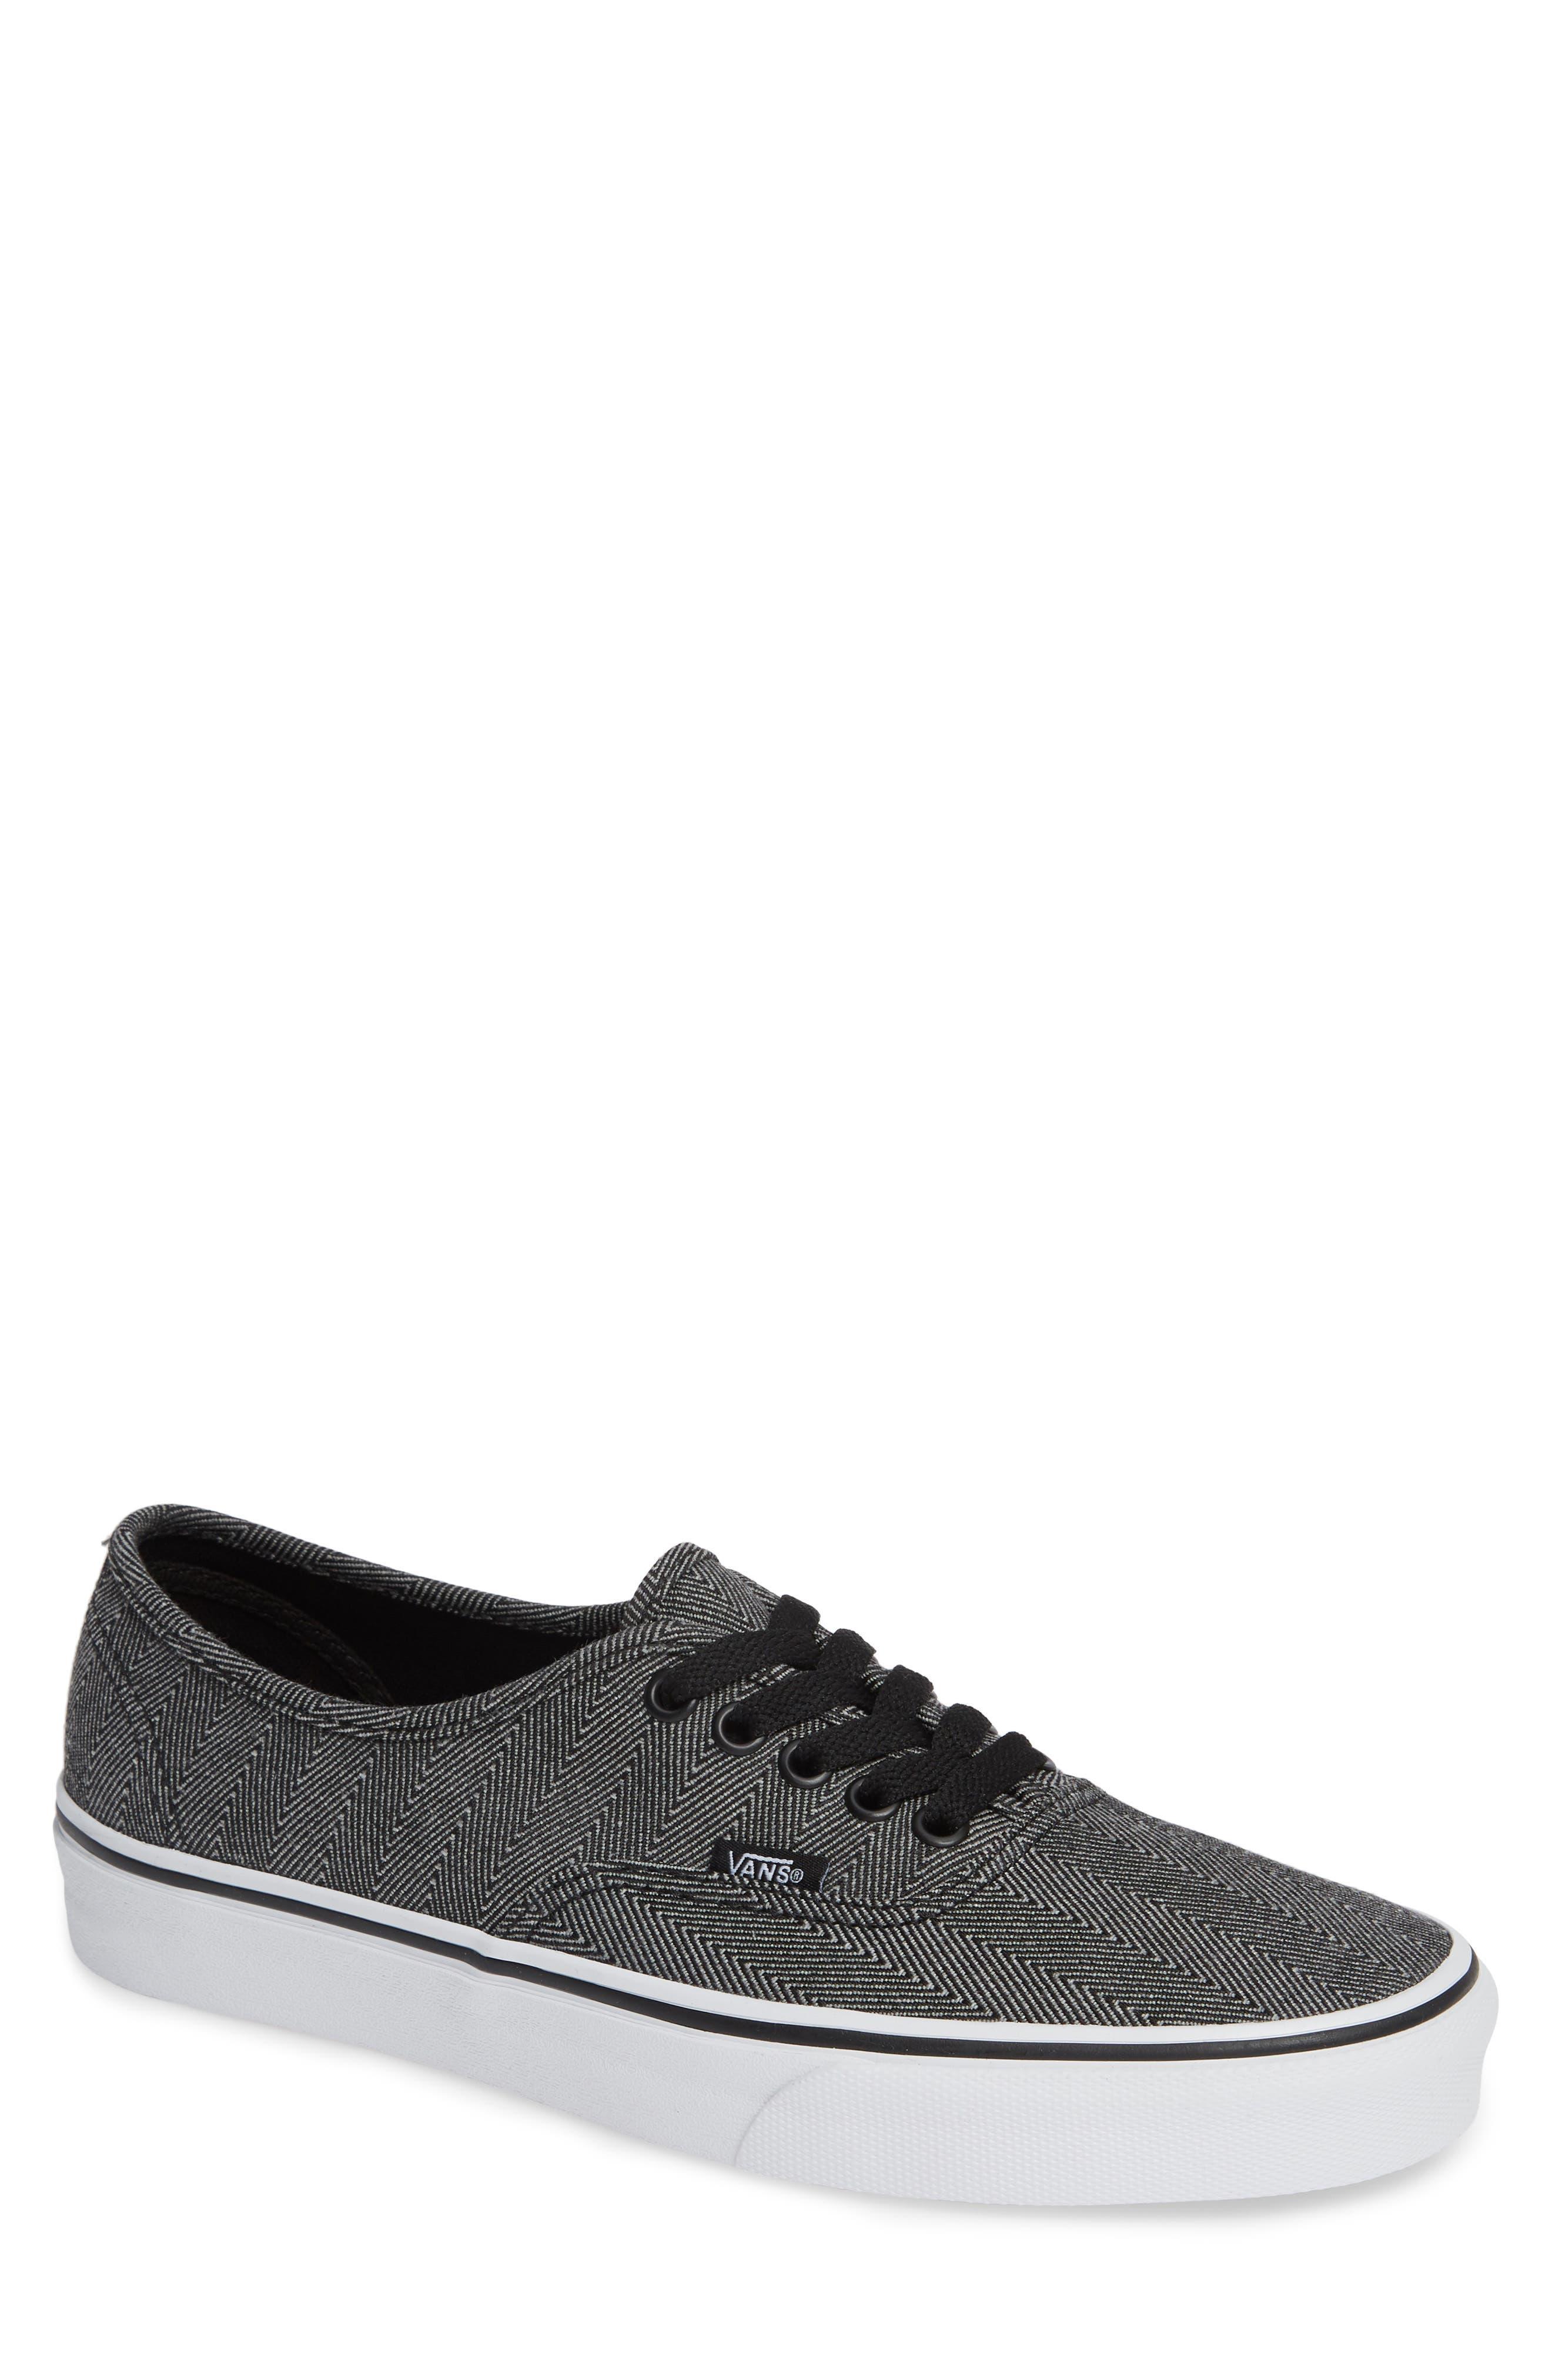 UA Authentic Sneaker,                         Main,                         color, BLACK/ TRUE WHITE